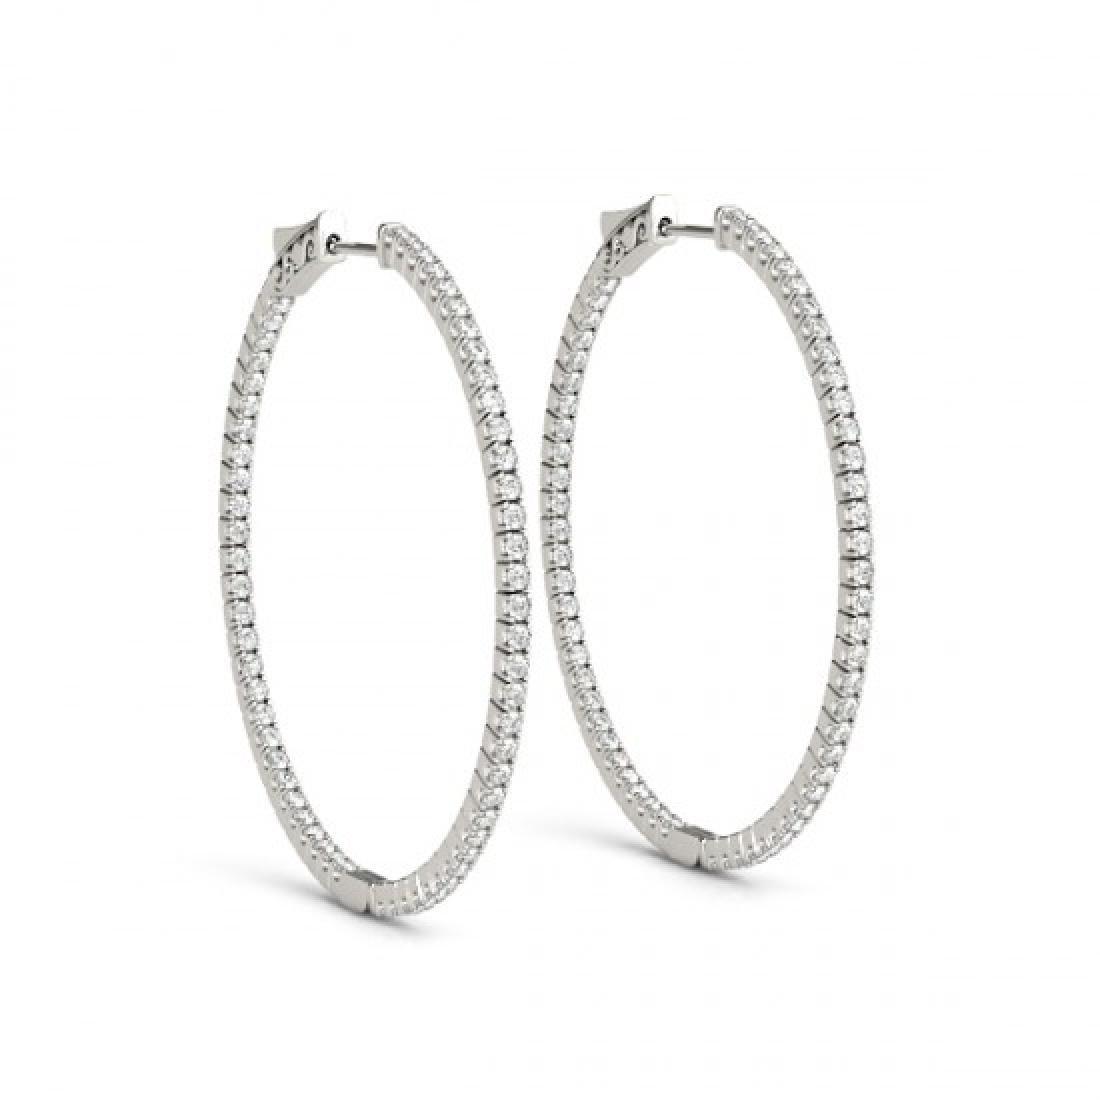 1 CTW Diamond VS/SI Certified 24 Mm Hoop Earrings 14K - 2